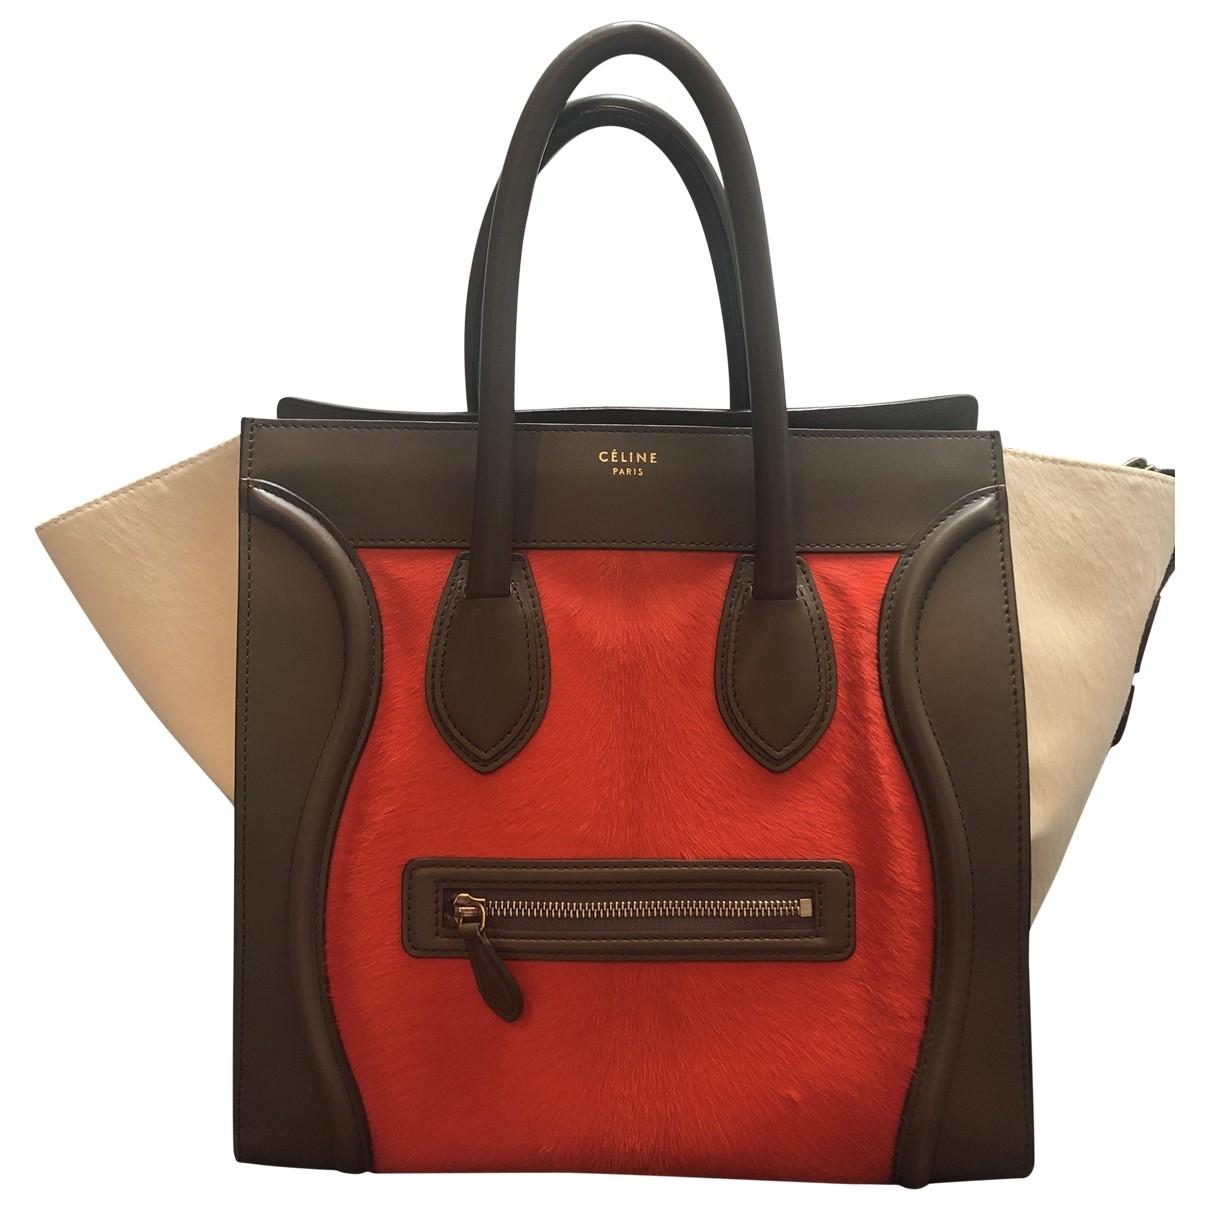 Celine Luggage Multicolour Pony-style calfskin handbag for Women \N